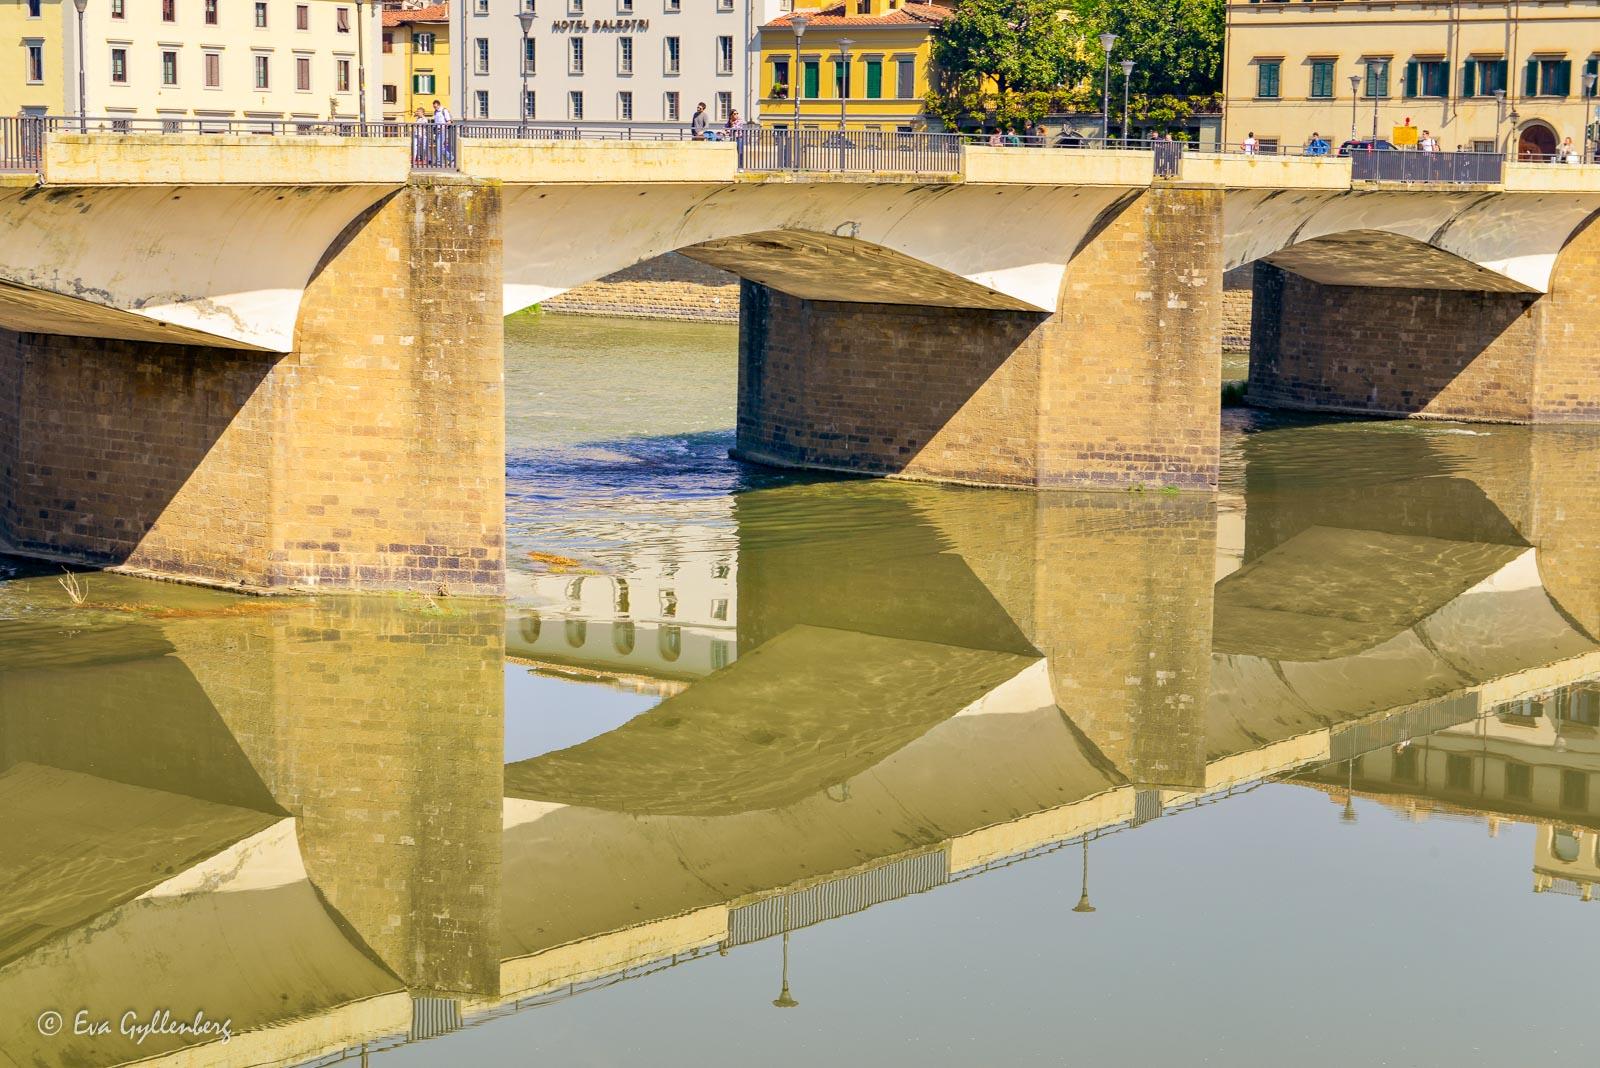 Fotoalbum från Florens 56